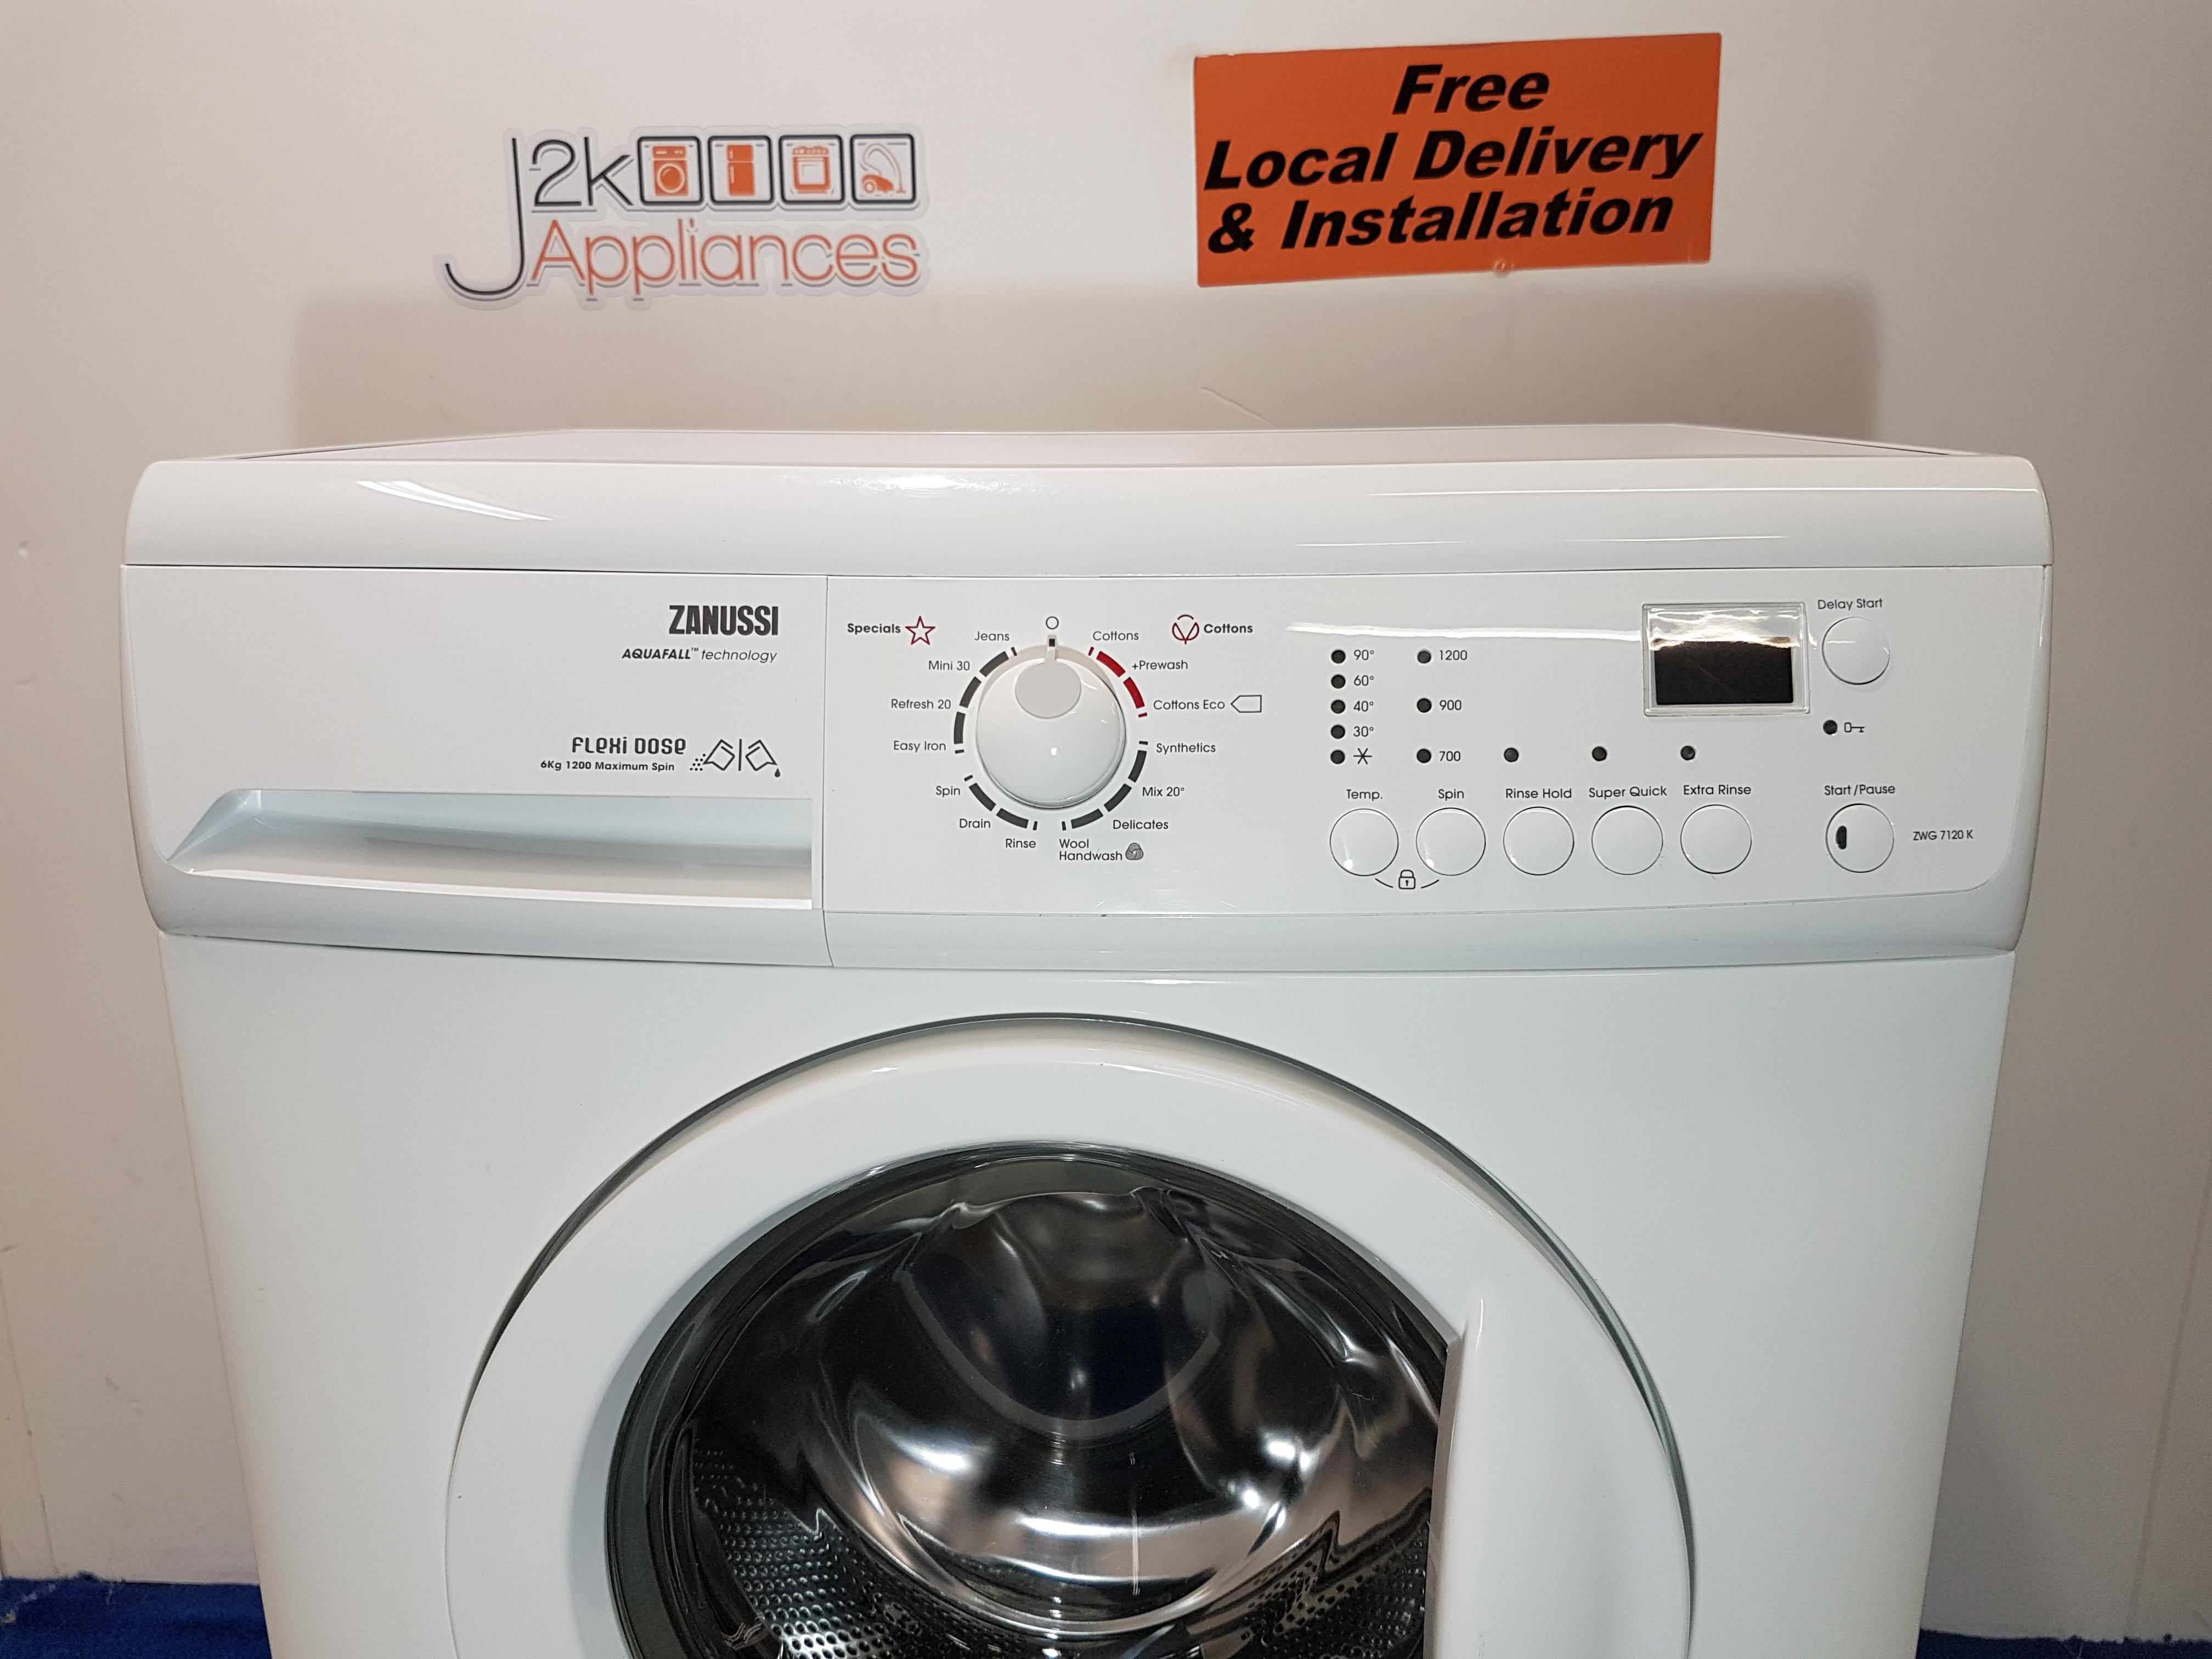 wm290 zanussi flexi dose aqua fall 6kg 1200 spin washing machine rh j2kappliances co uk hotpoint aquarius 1200 wd62 manual hotpoint ultima 1200 washing machine manual